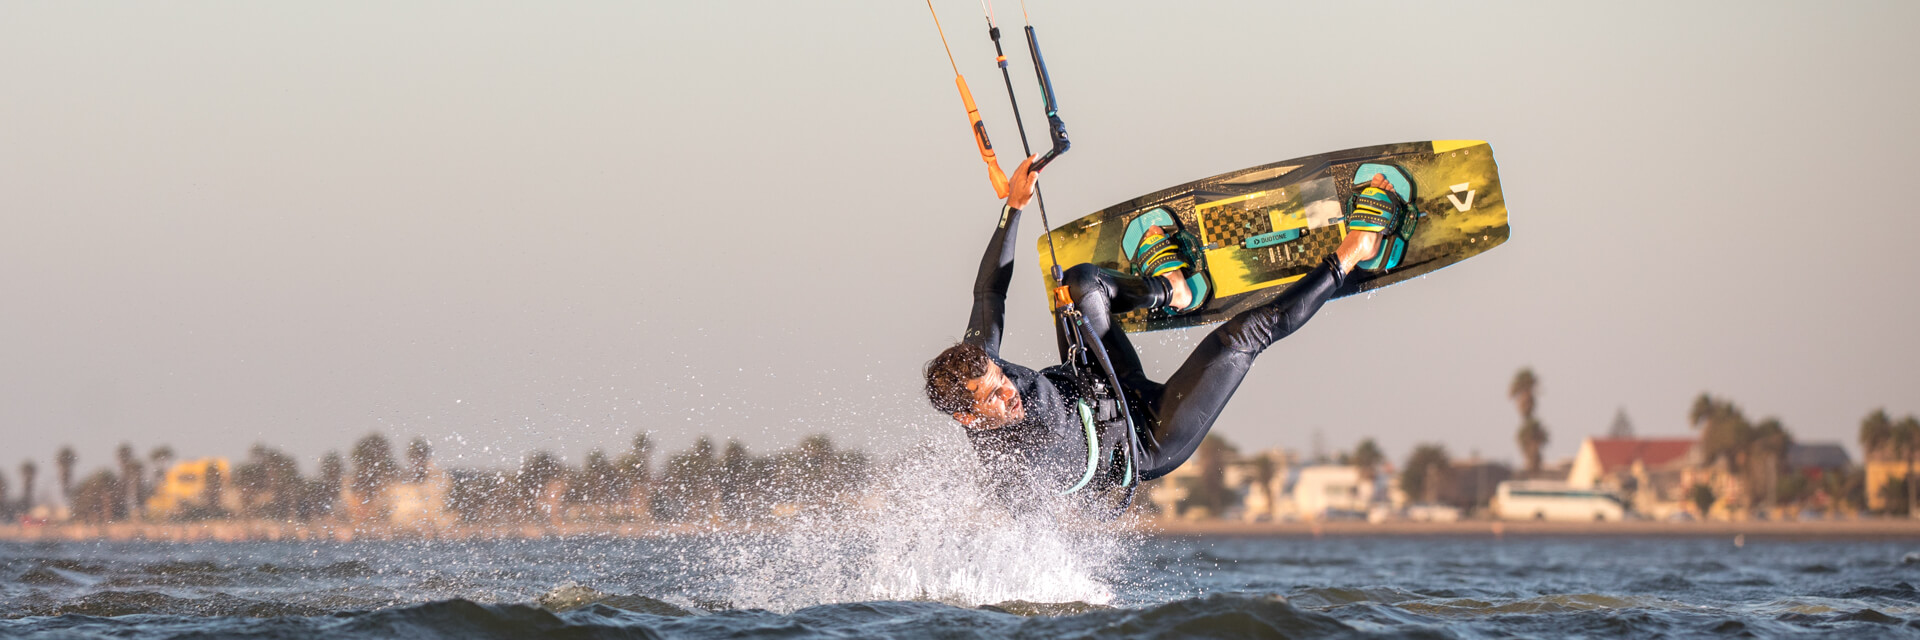 DuoTone Enity Rrgo Kite Board Bindung 2020